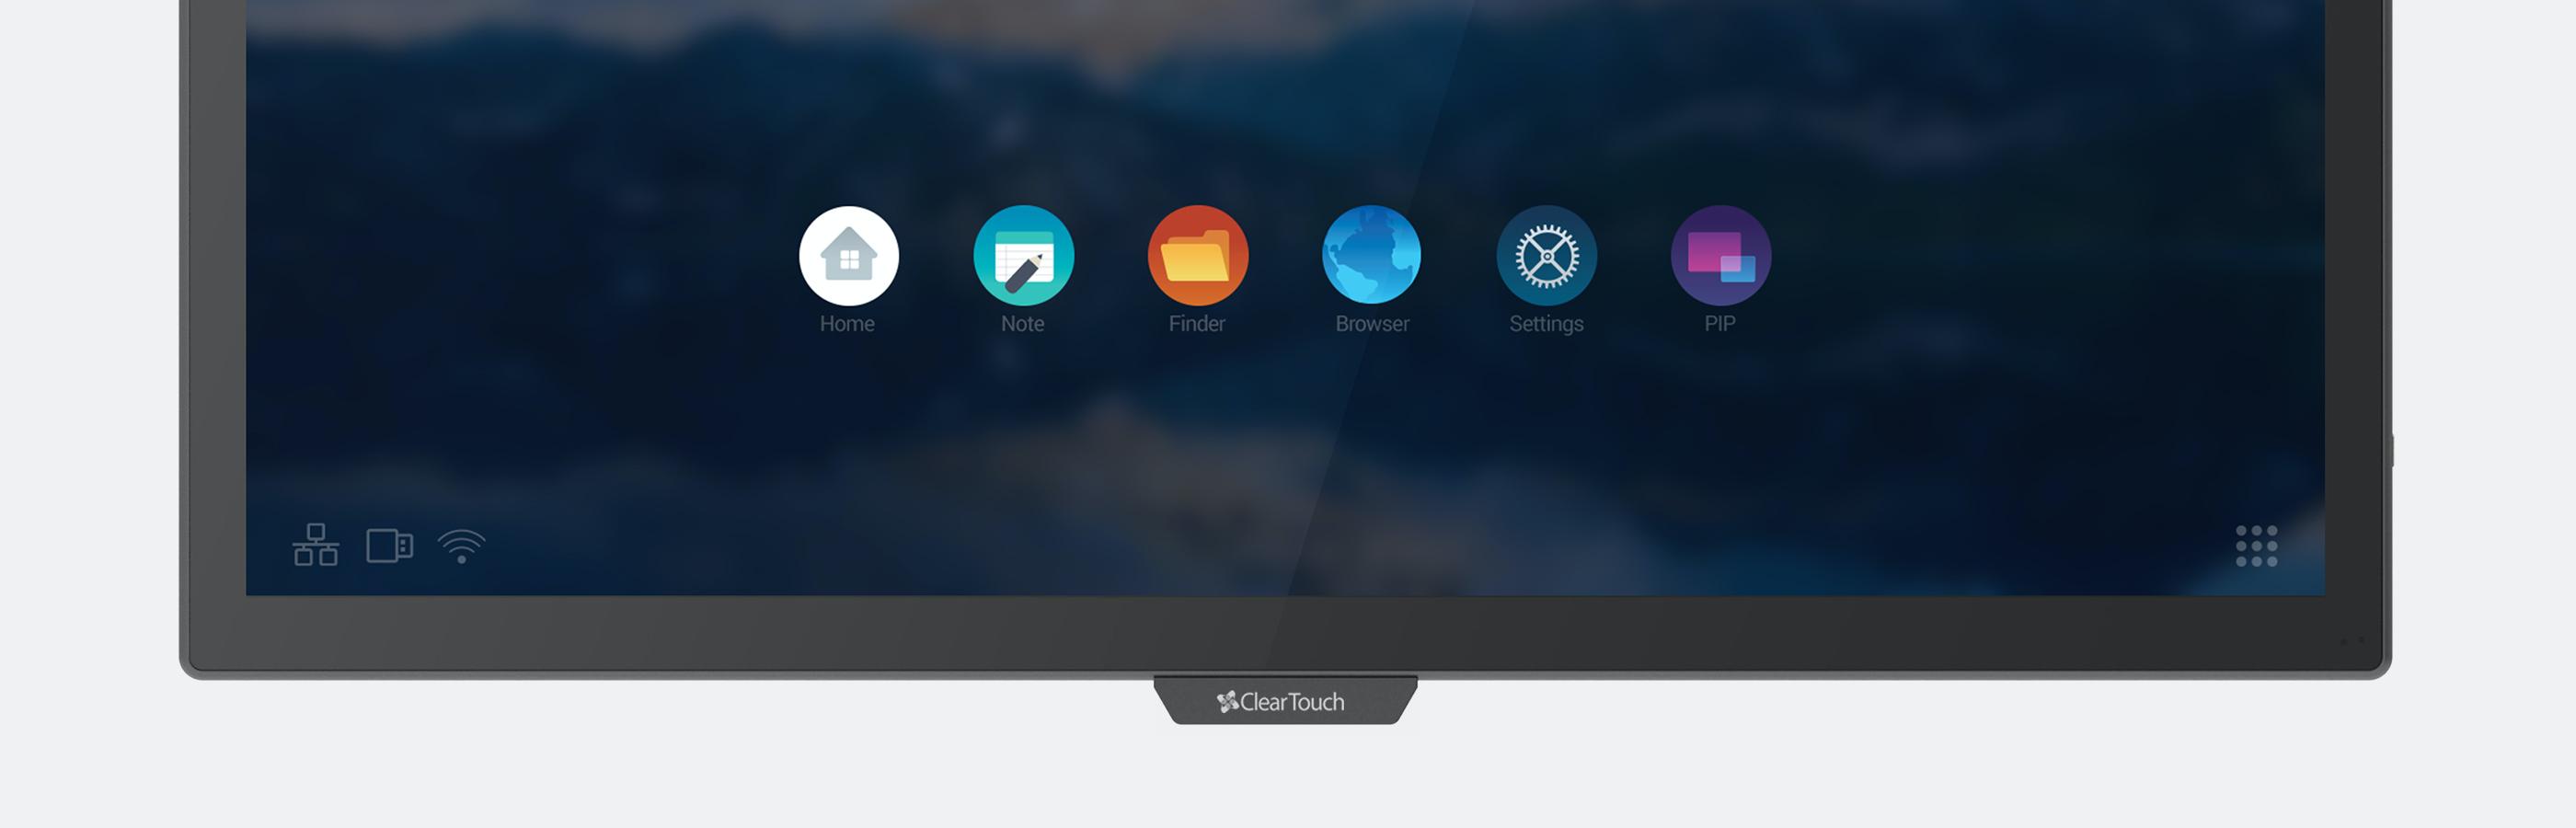 4k Ultra HD Screen Resolution